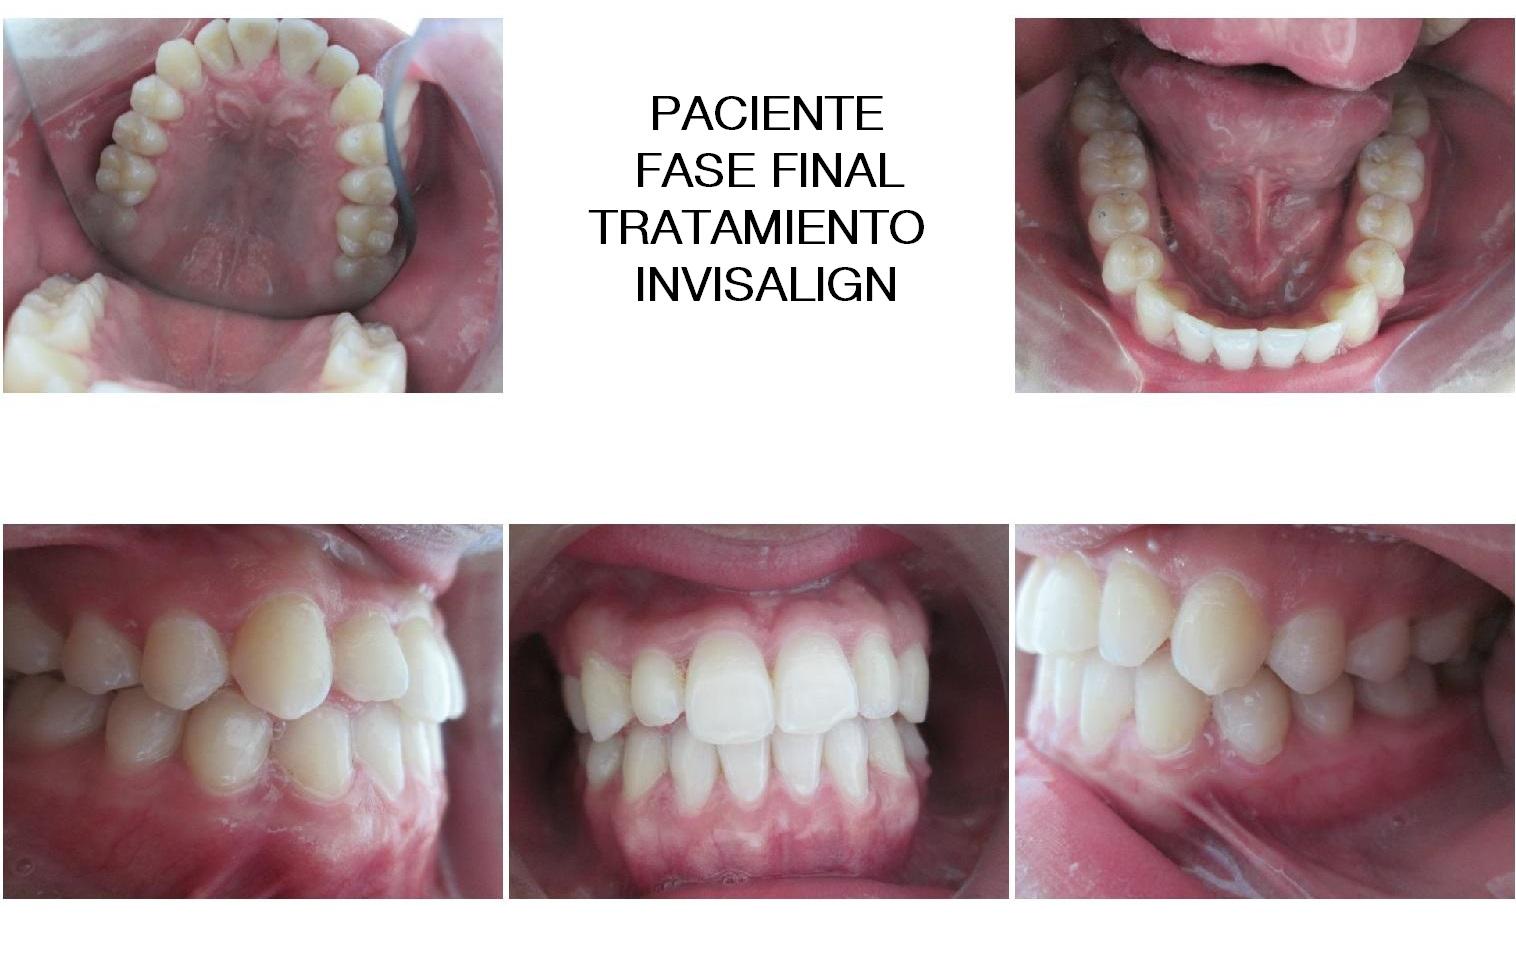 Clinica Mariana sacoto Navia expertos Ortodoncia Invisalign Barcelona